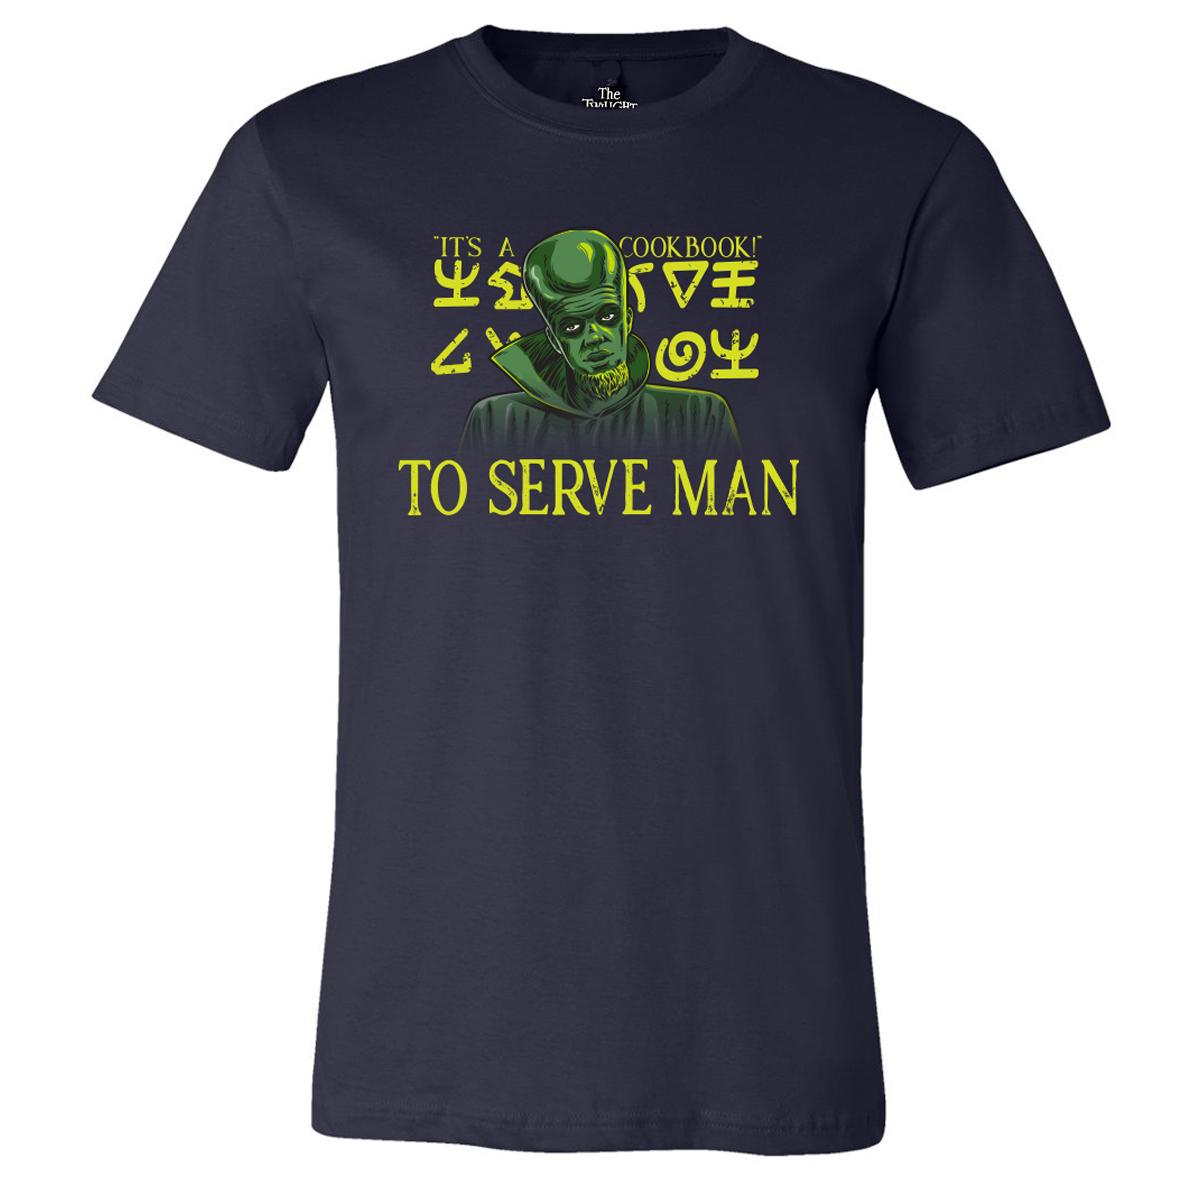 The Twilight Zone Serve Man T-Shirt